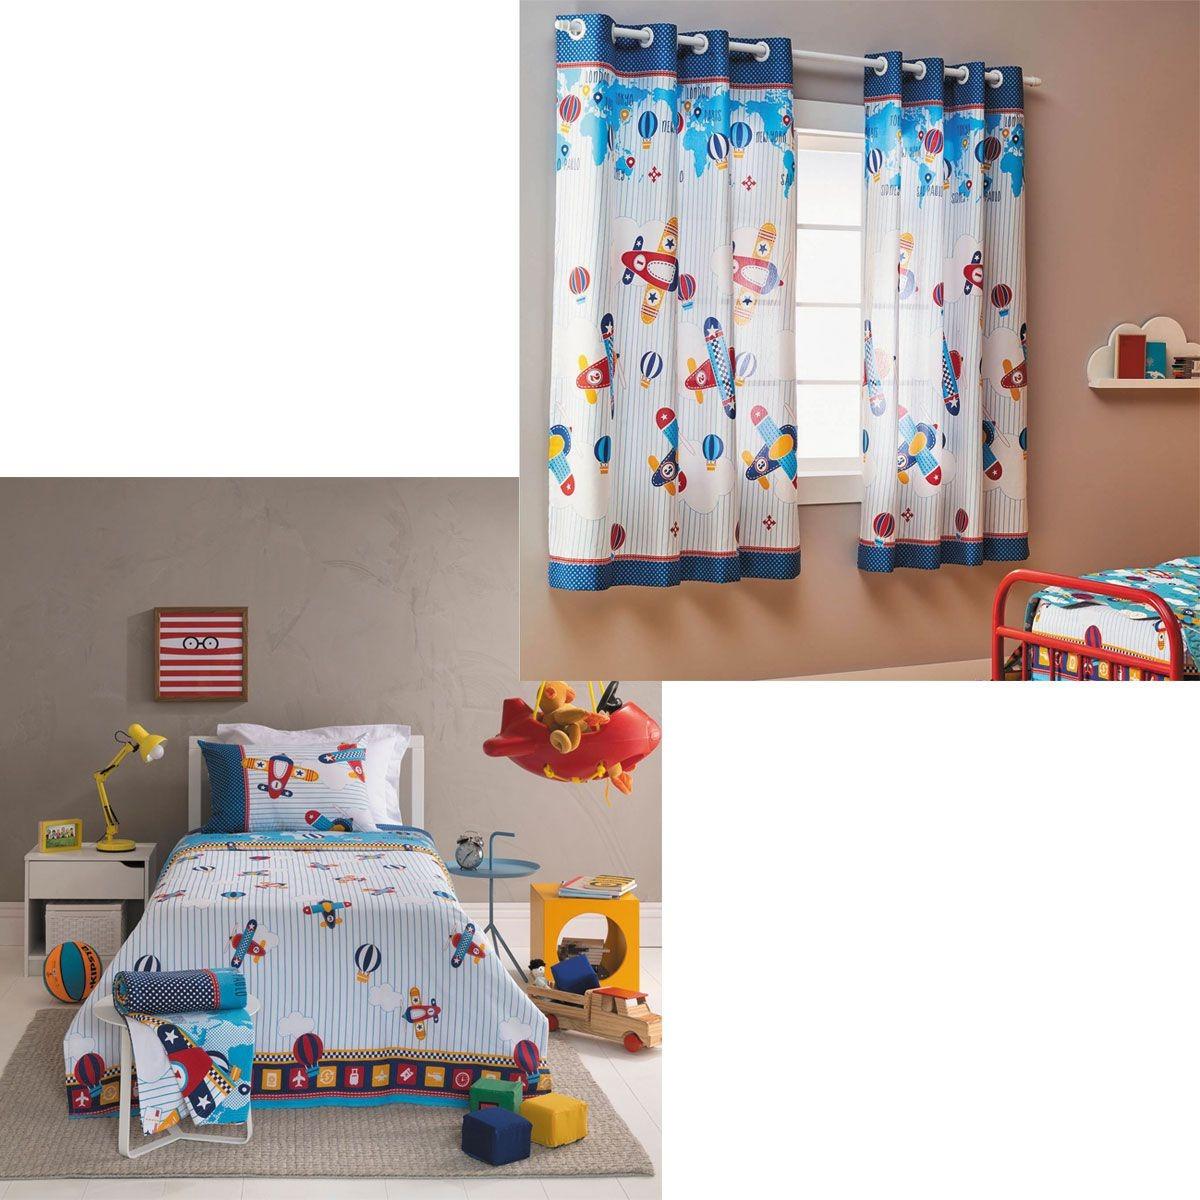 841c93b545 kit aviões infantil menino cortina + jogo cama santista kids. Carregando  zoom.